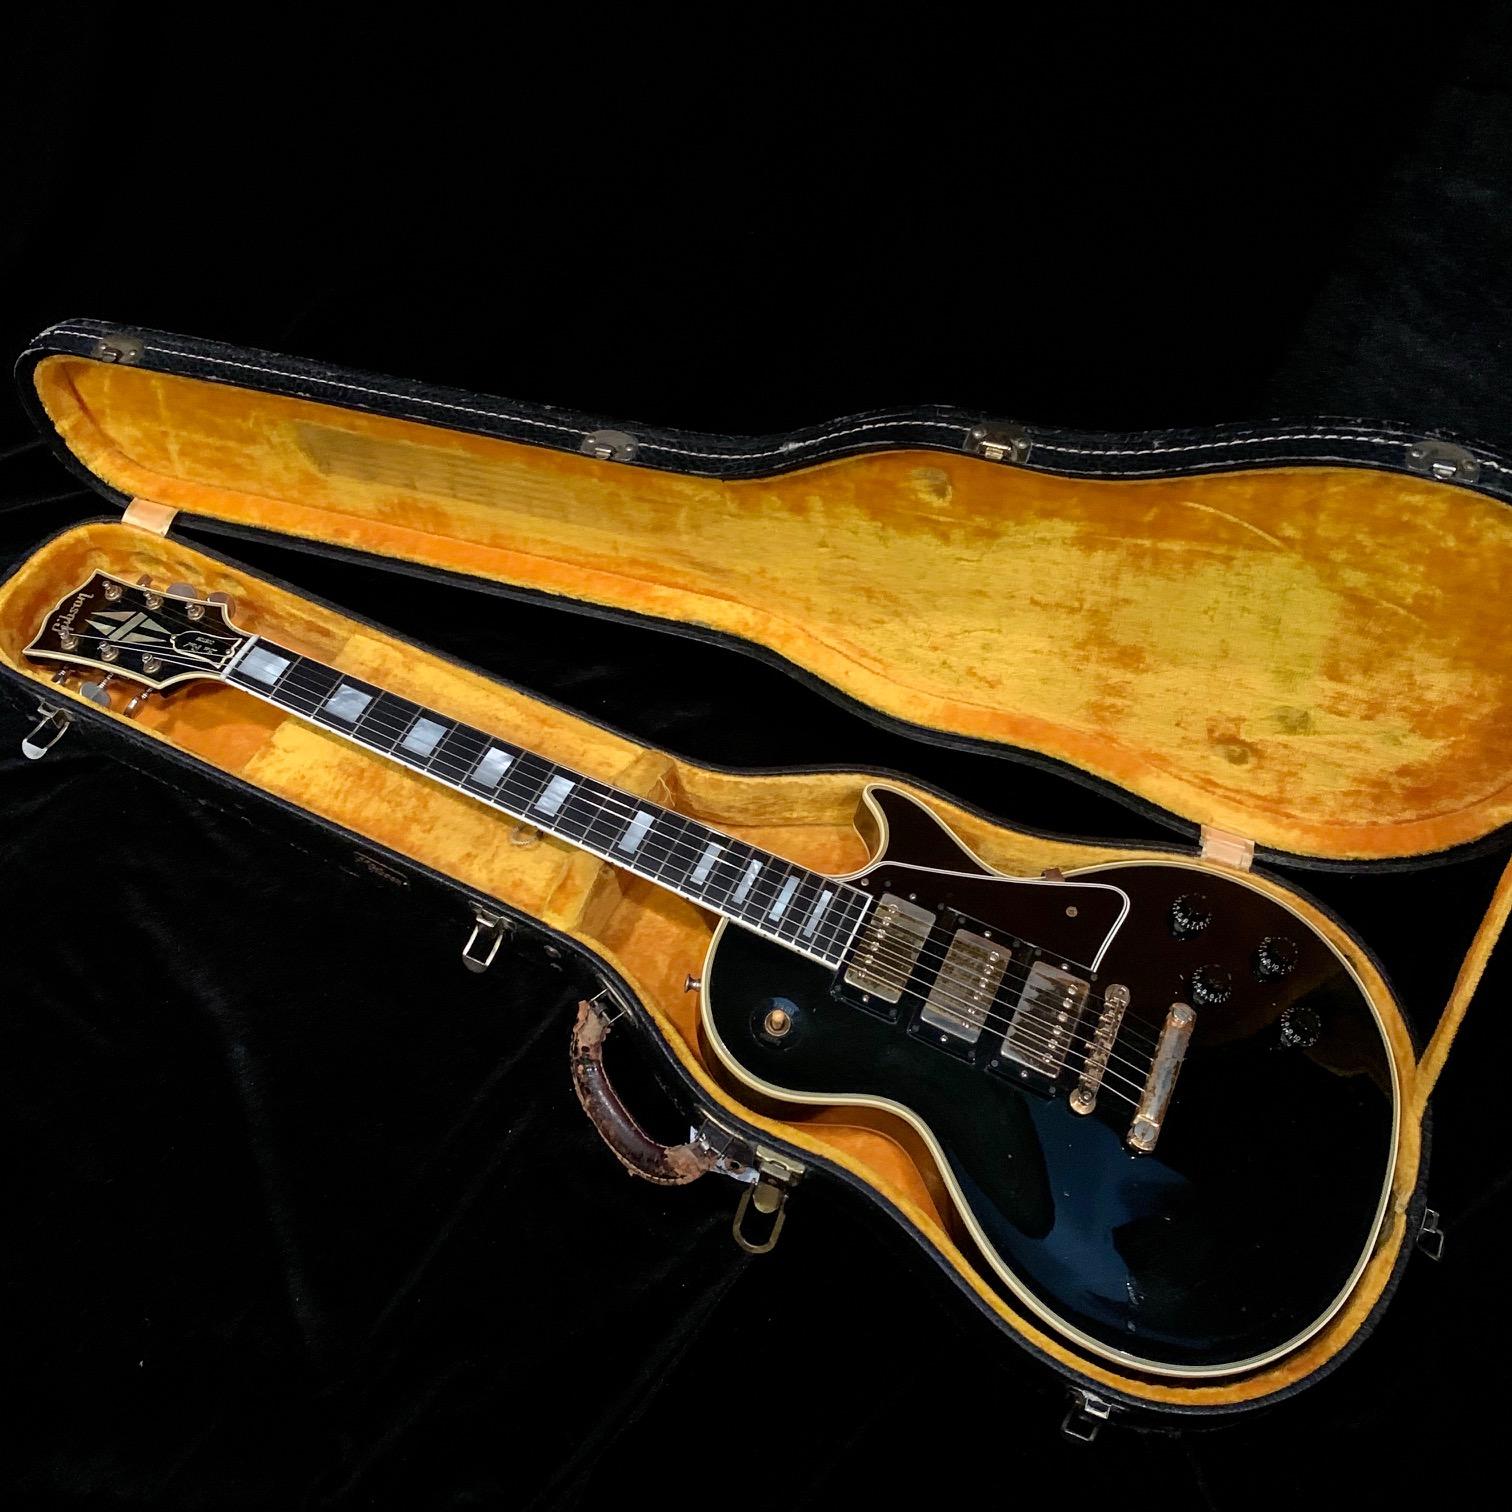 1960 Gibson Les Paul Custom Black Beauty SN# 00625